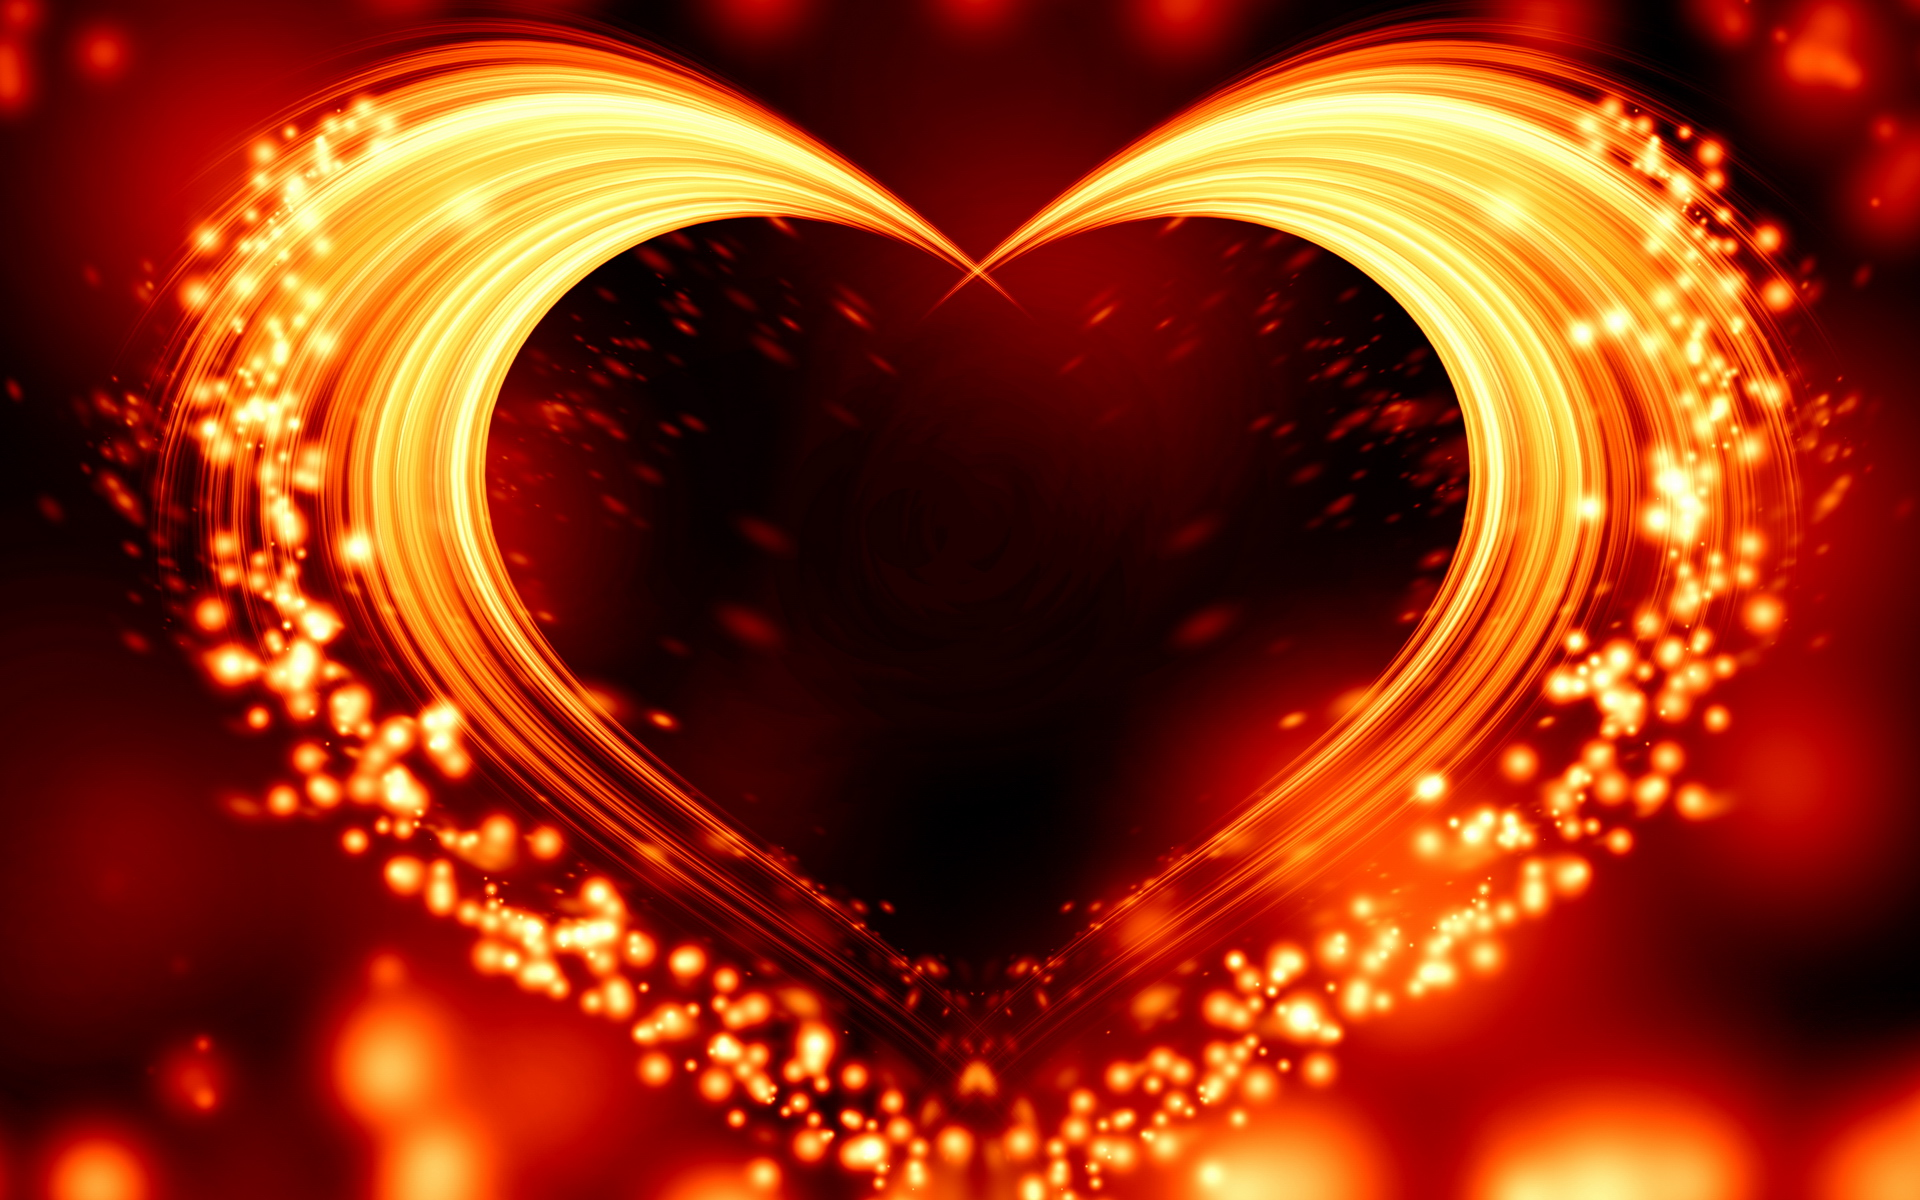 love-heart-image-132968-5462702